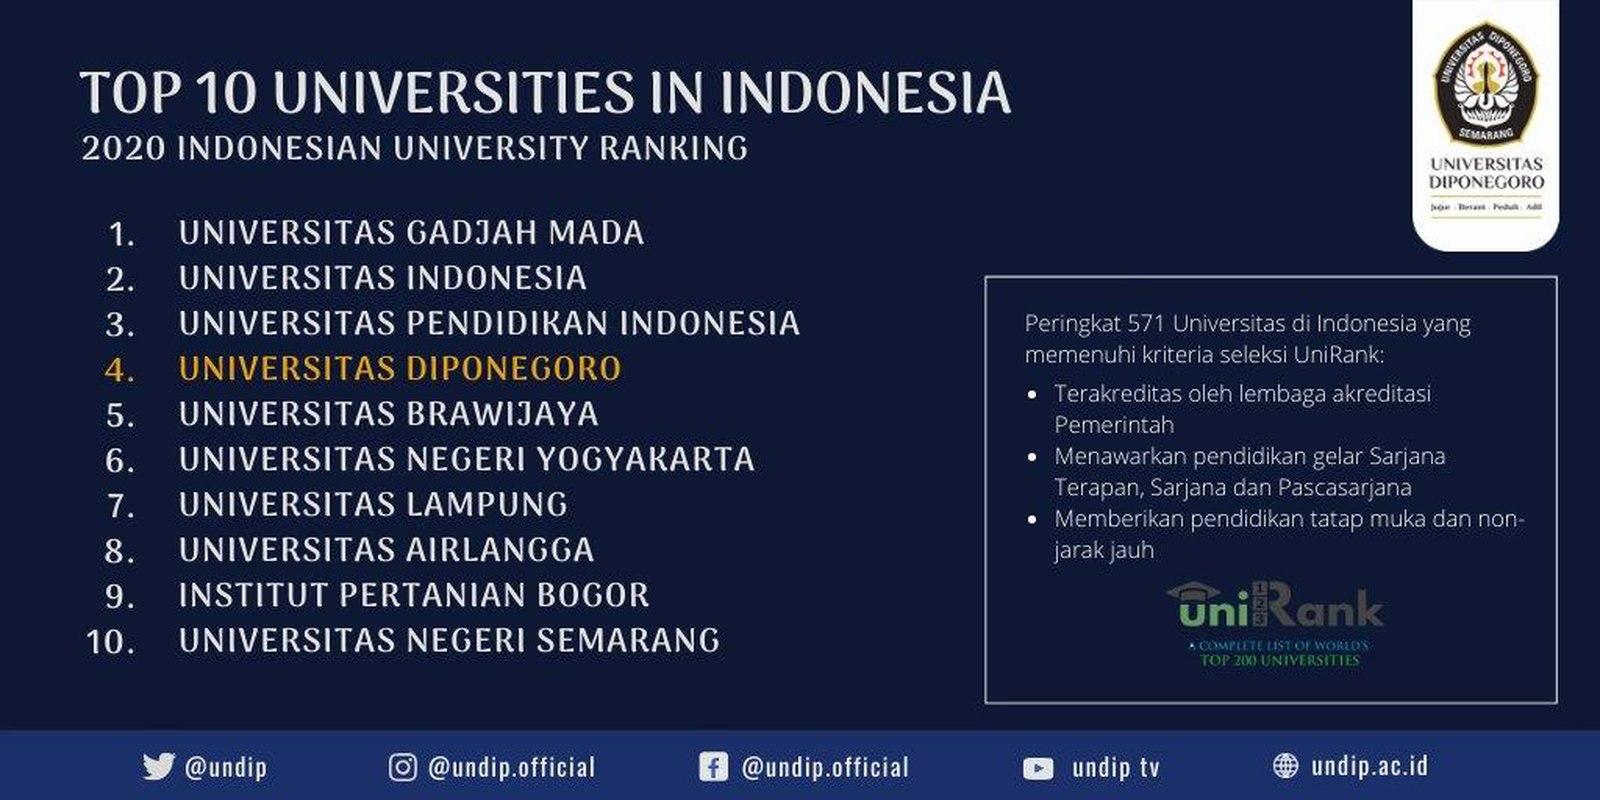 Undip Menempati Urutan Perguruan Tinggi Terbaik ke-4 di Indonesia Versi UniRank (4ICU.org) Tahun 2020